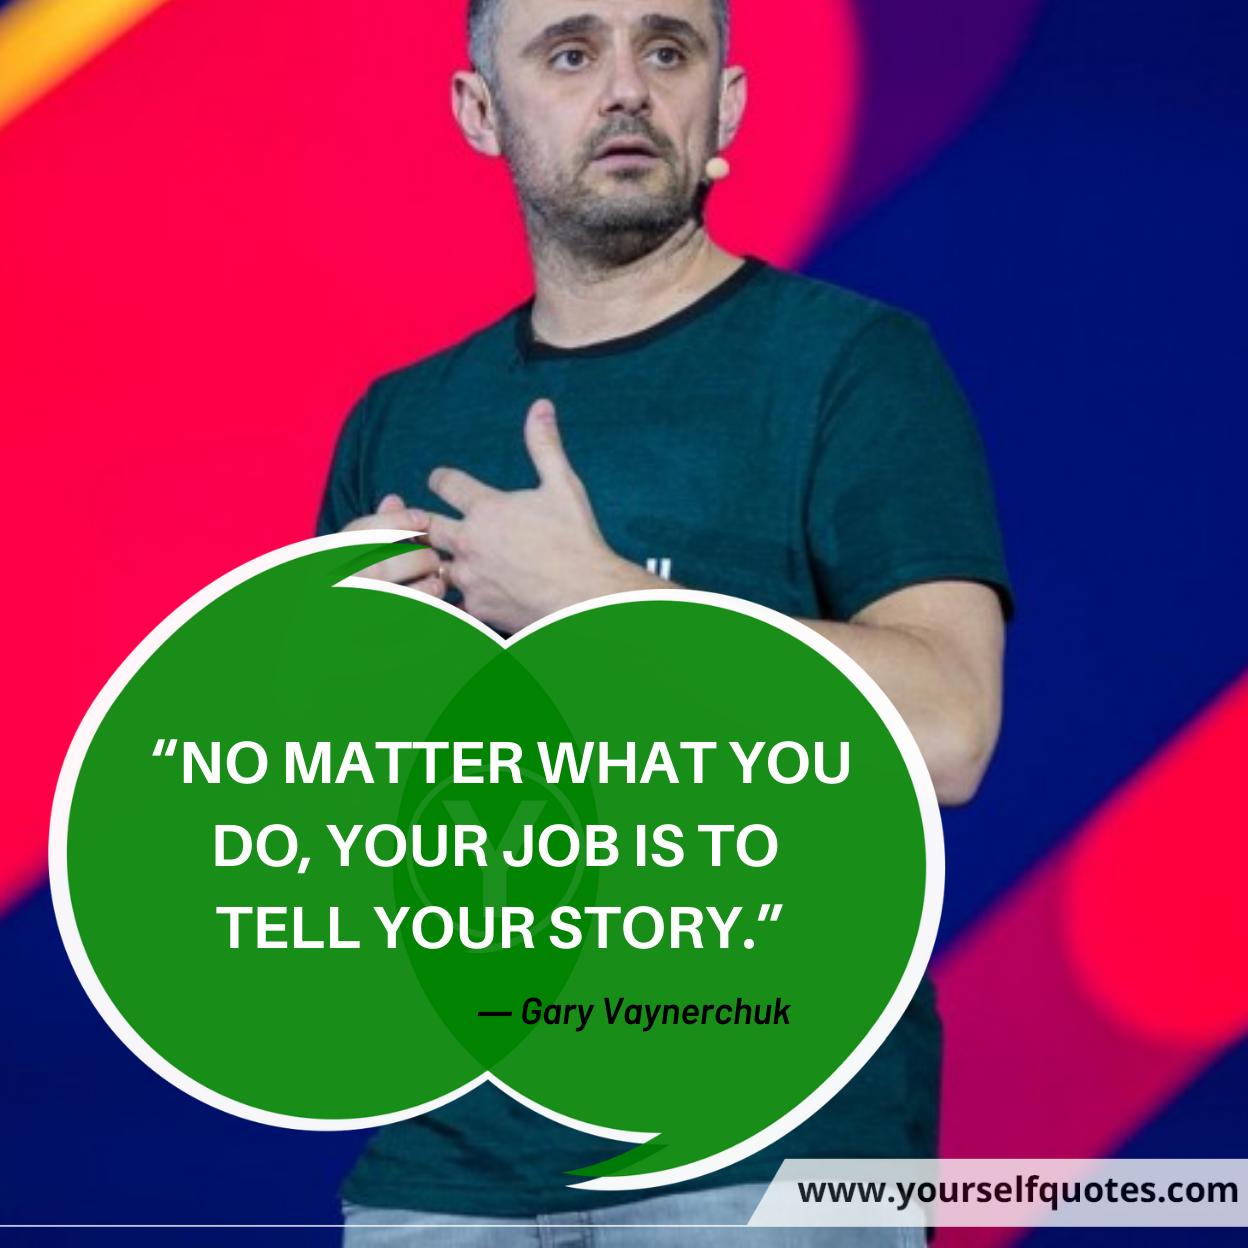 Gary Vaynerchuk Quotes Images